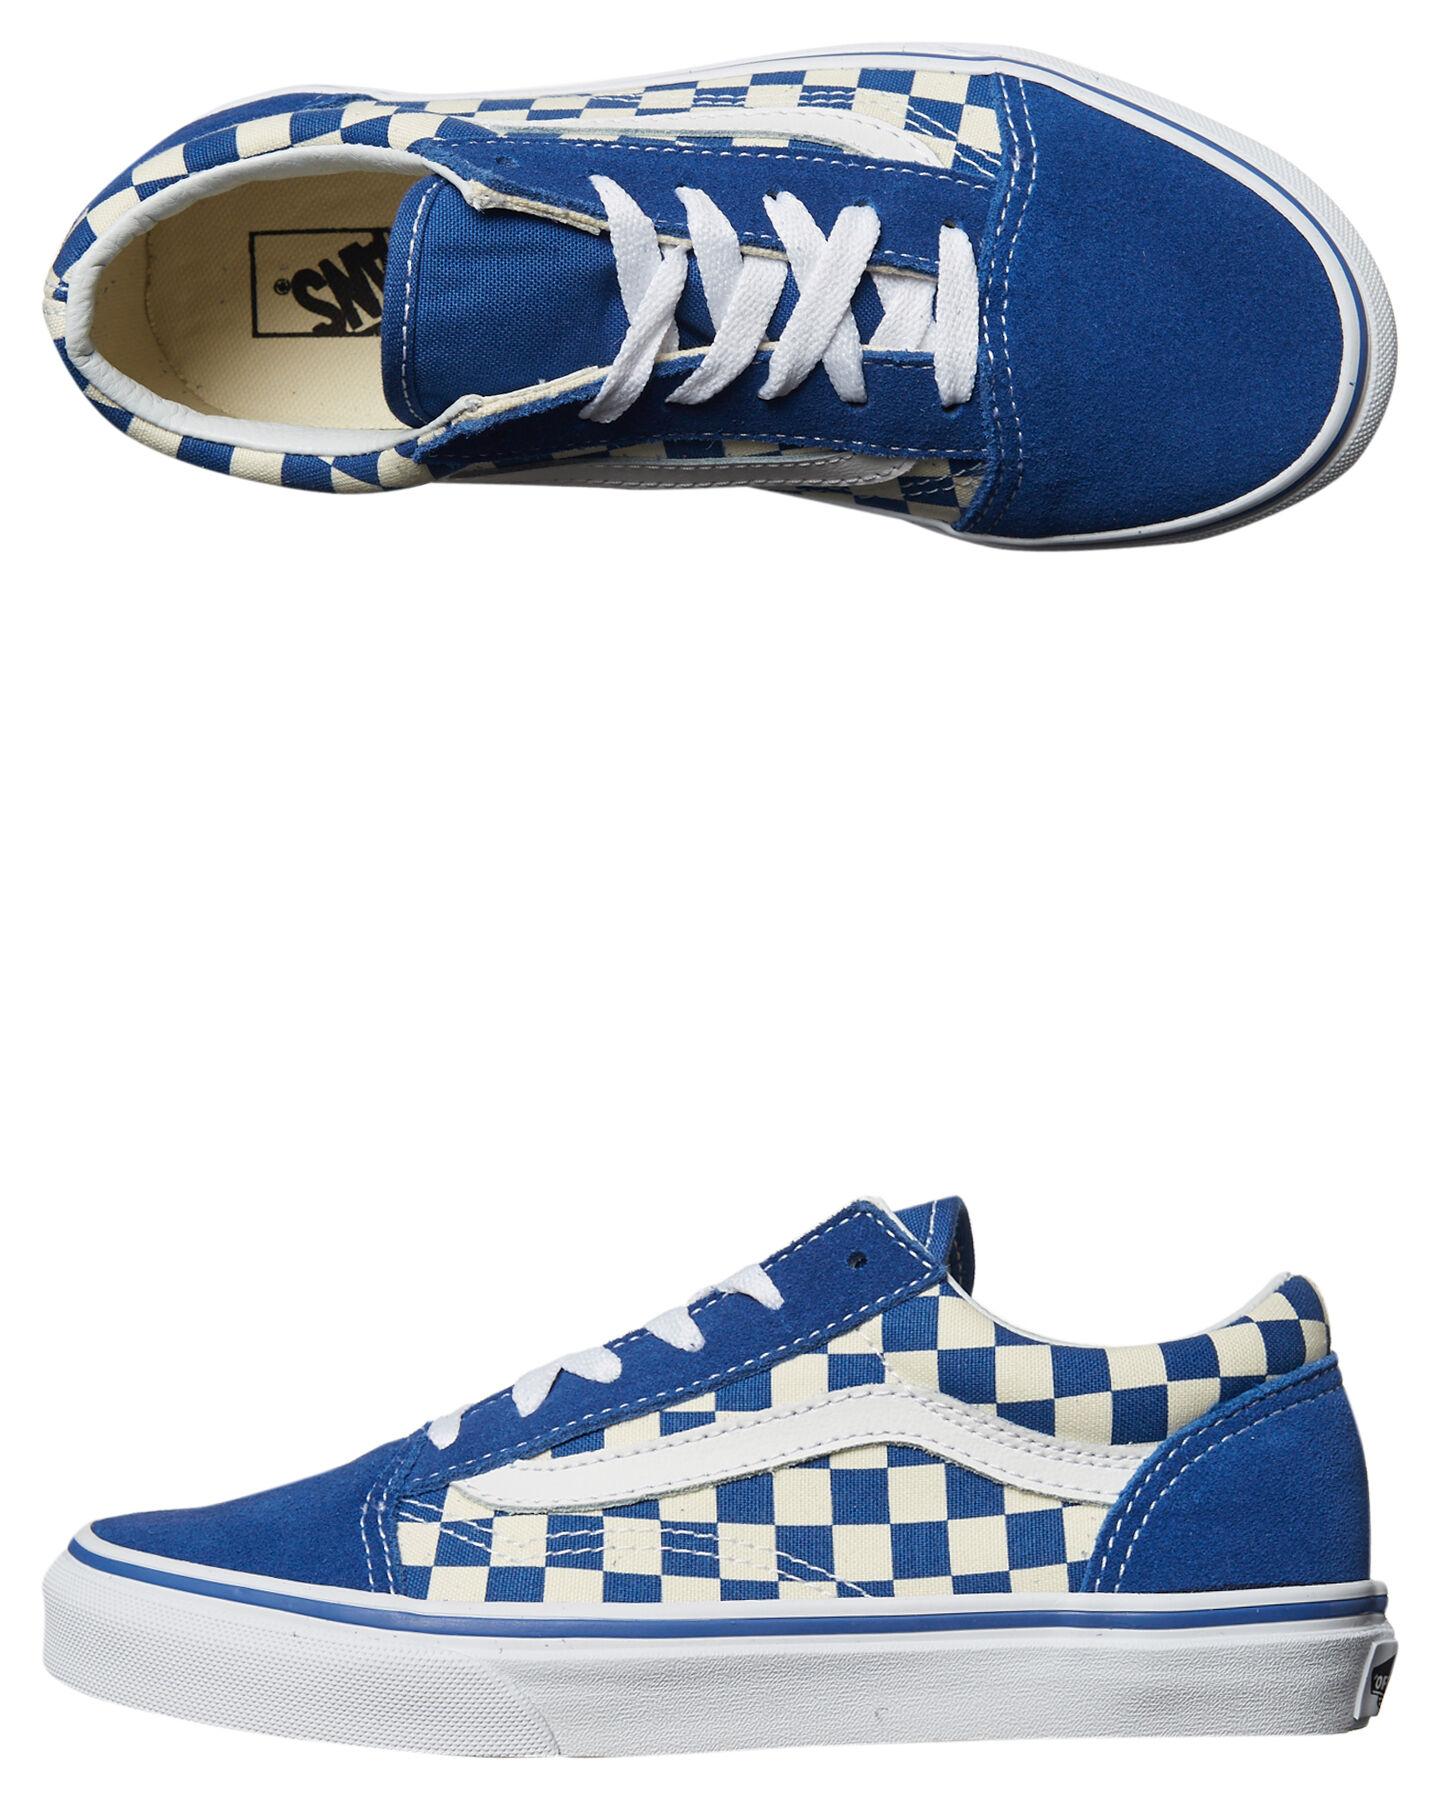 Buy vans kids blue   OFF59% Discounts 78d8061e4c3